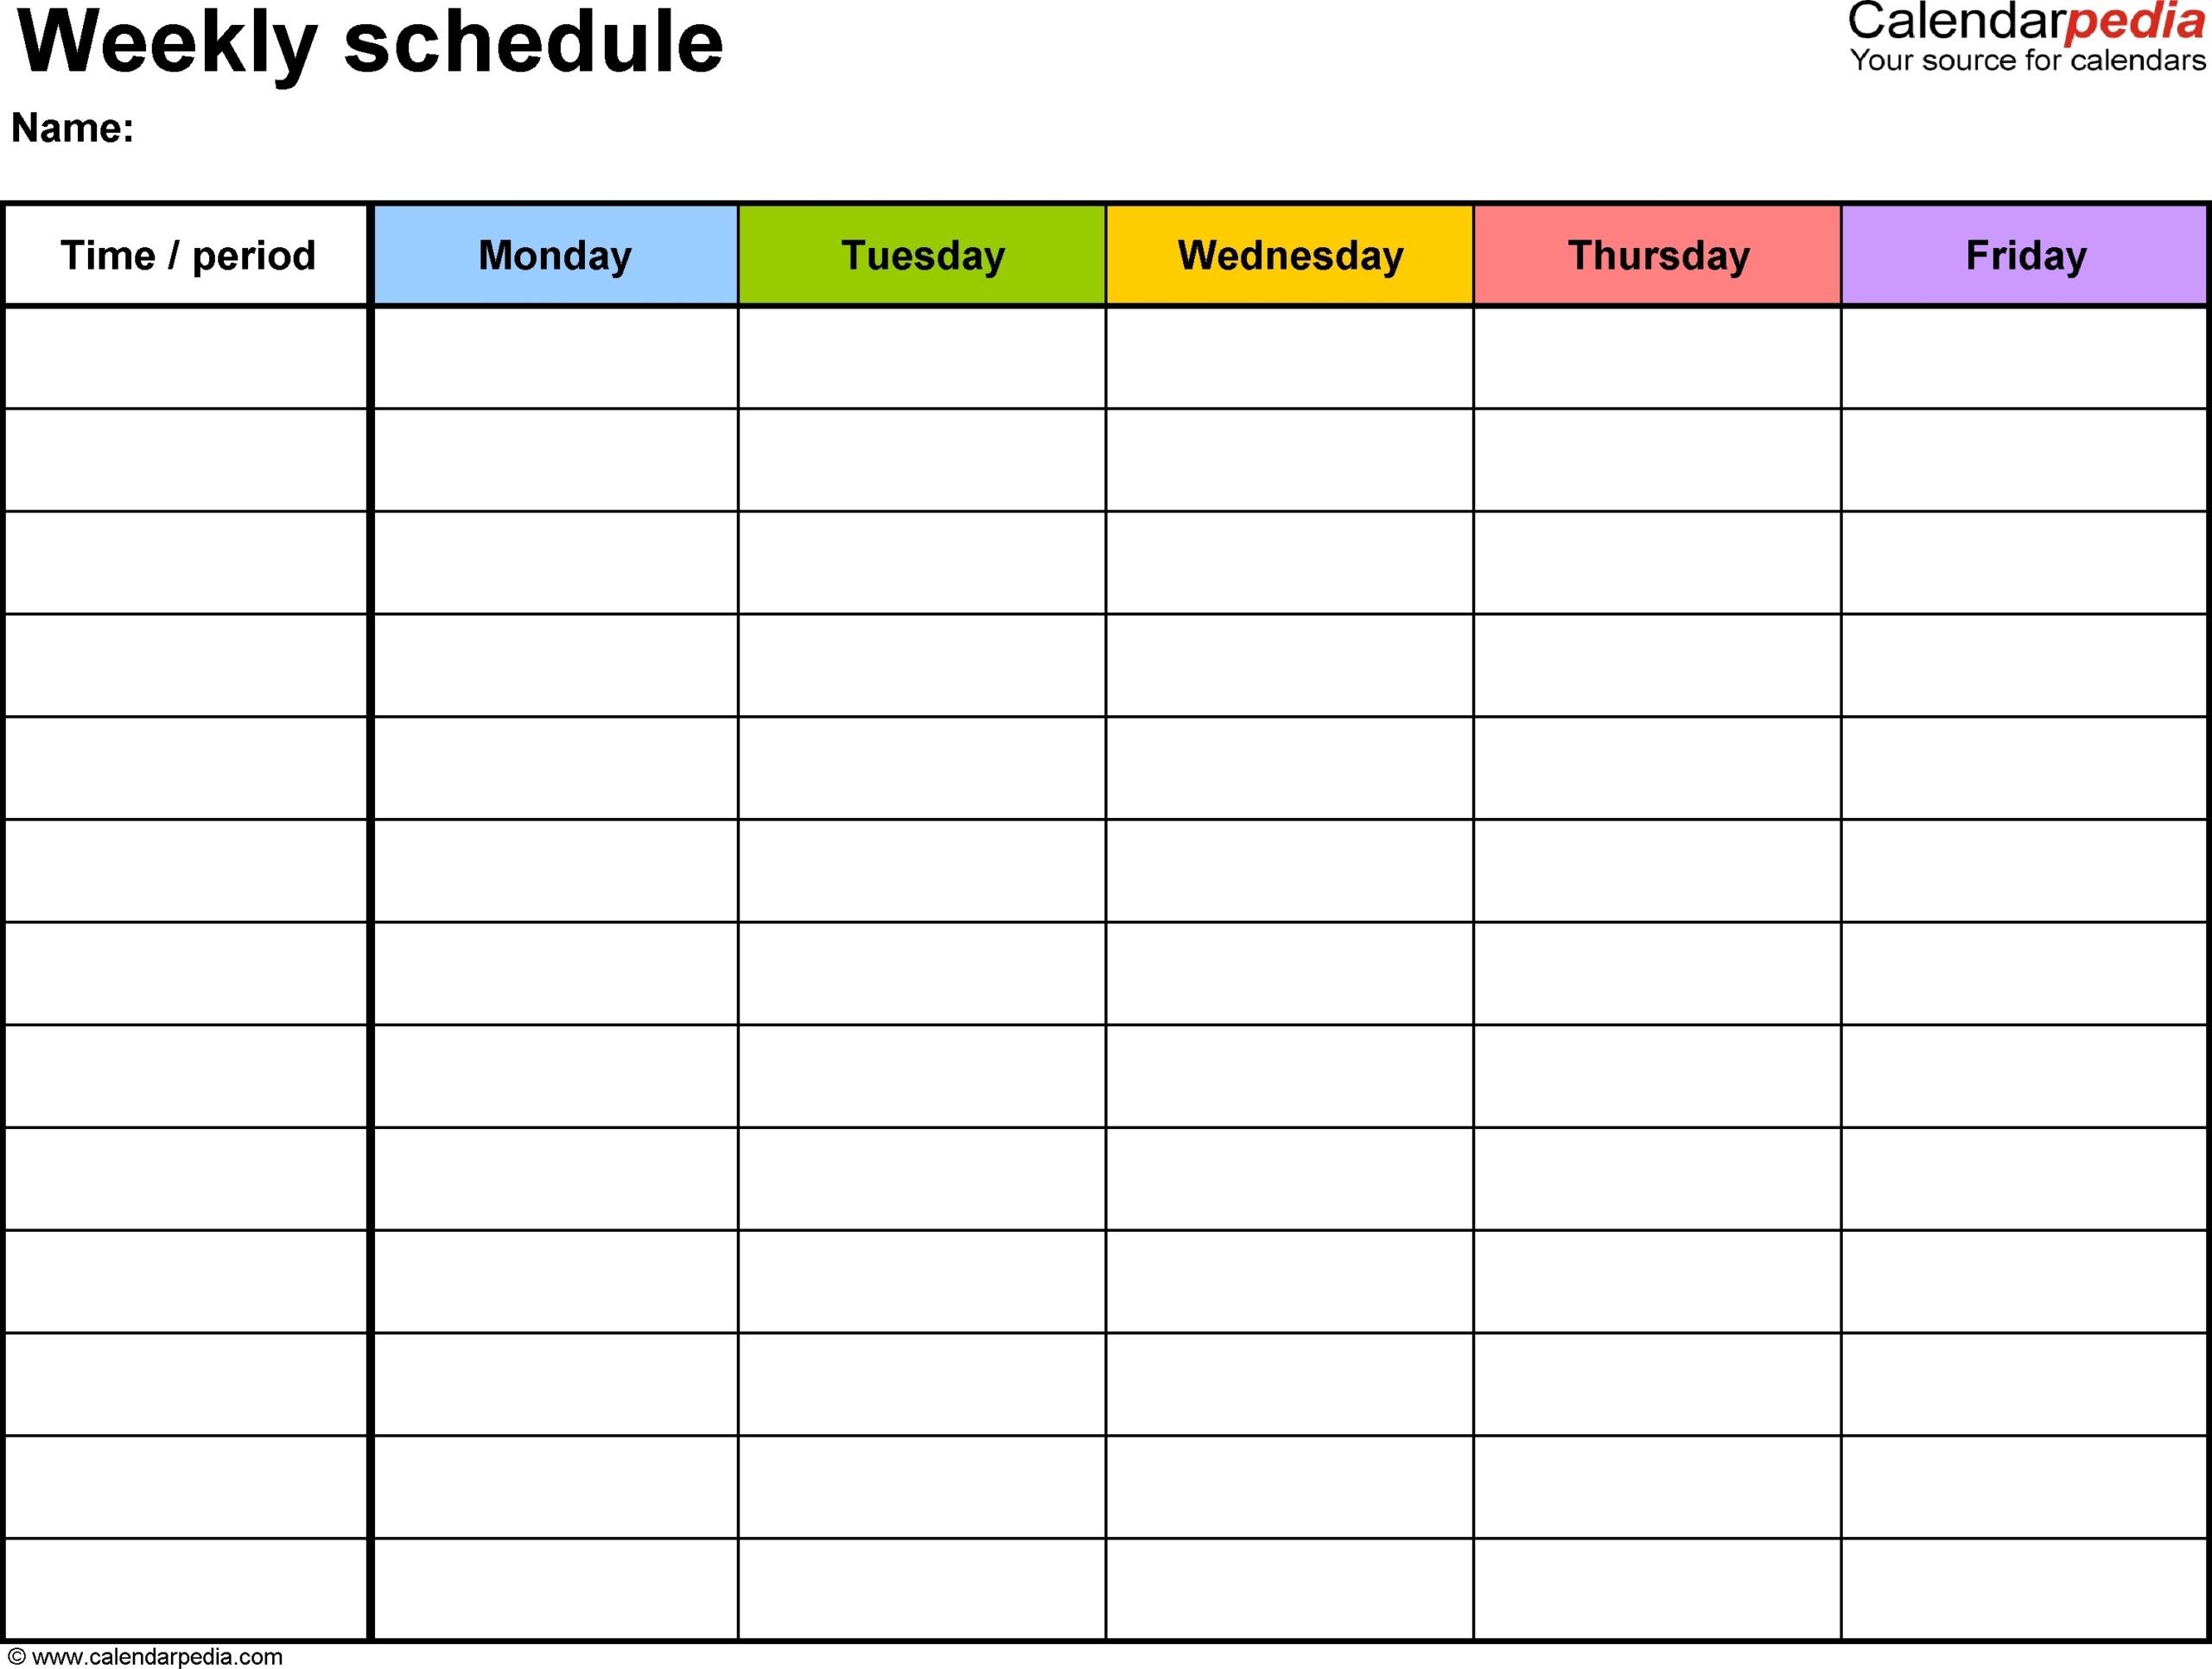 Printable Calendar With Time Slots | Ten Free Printable